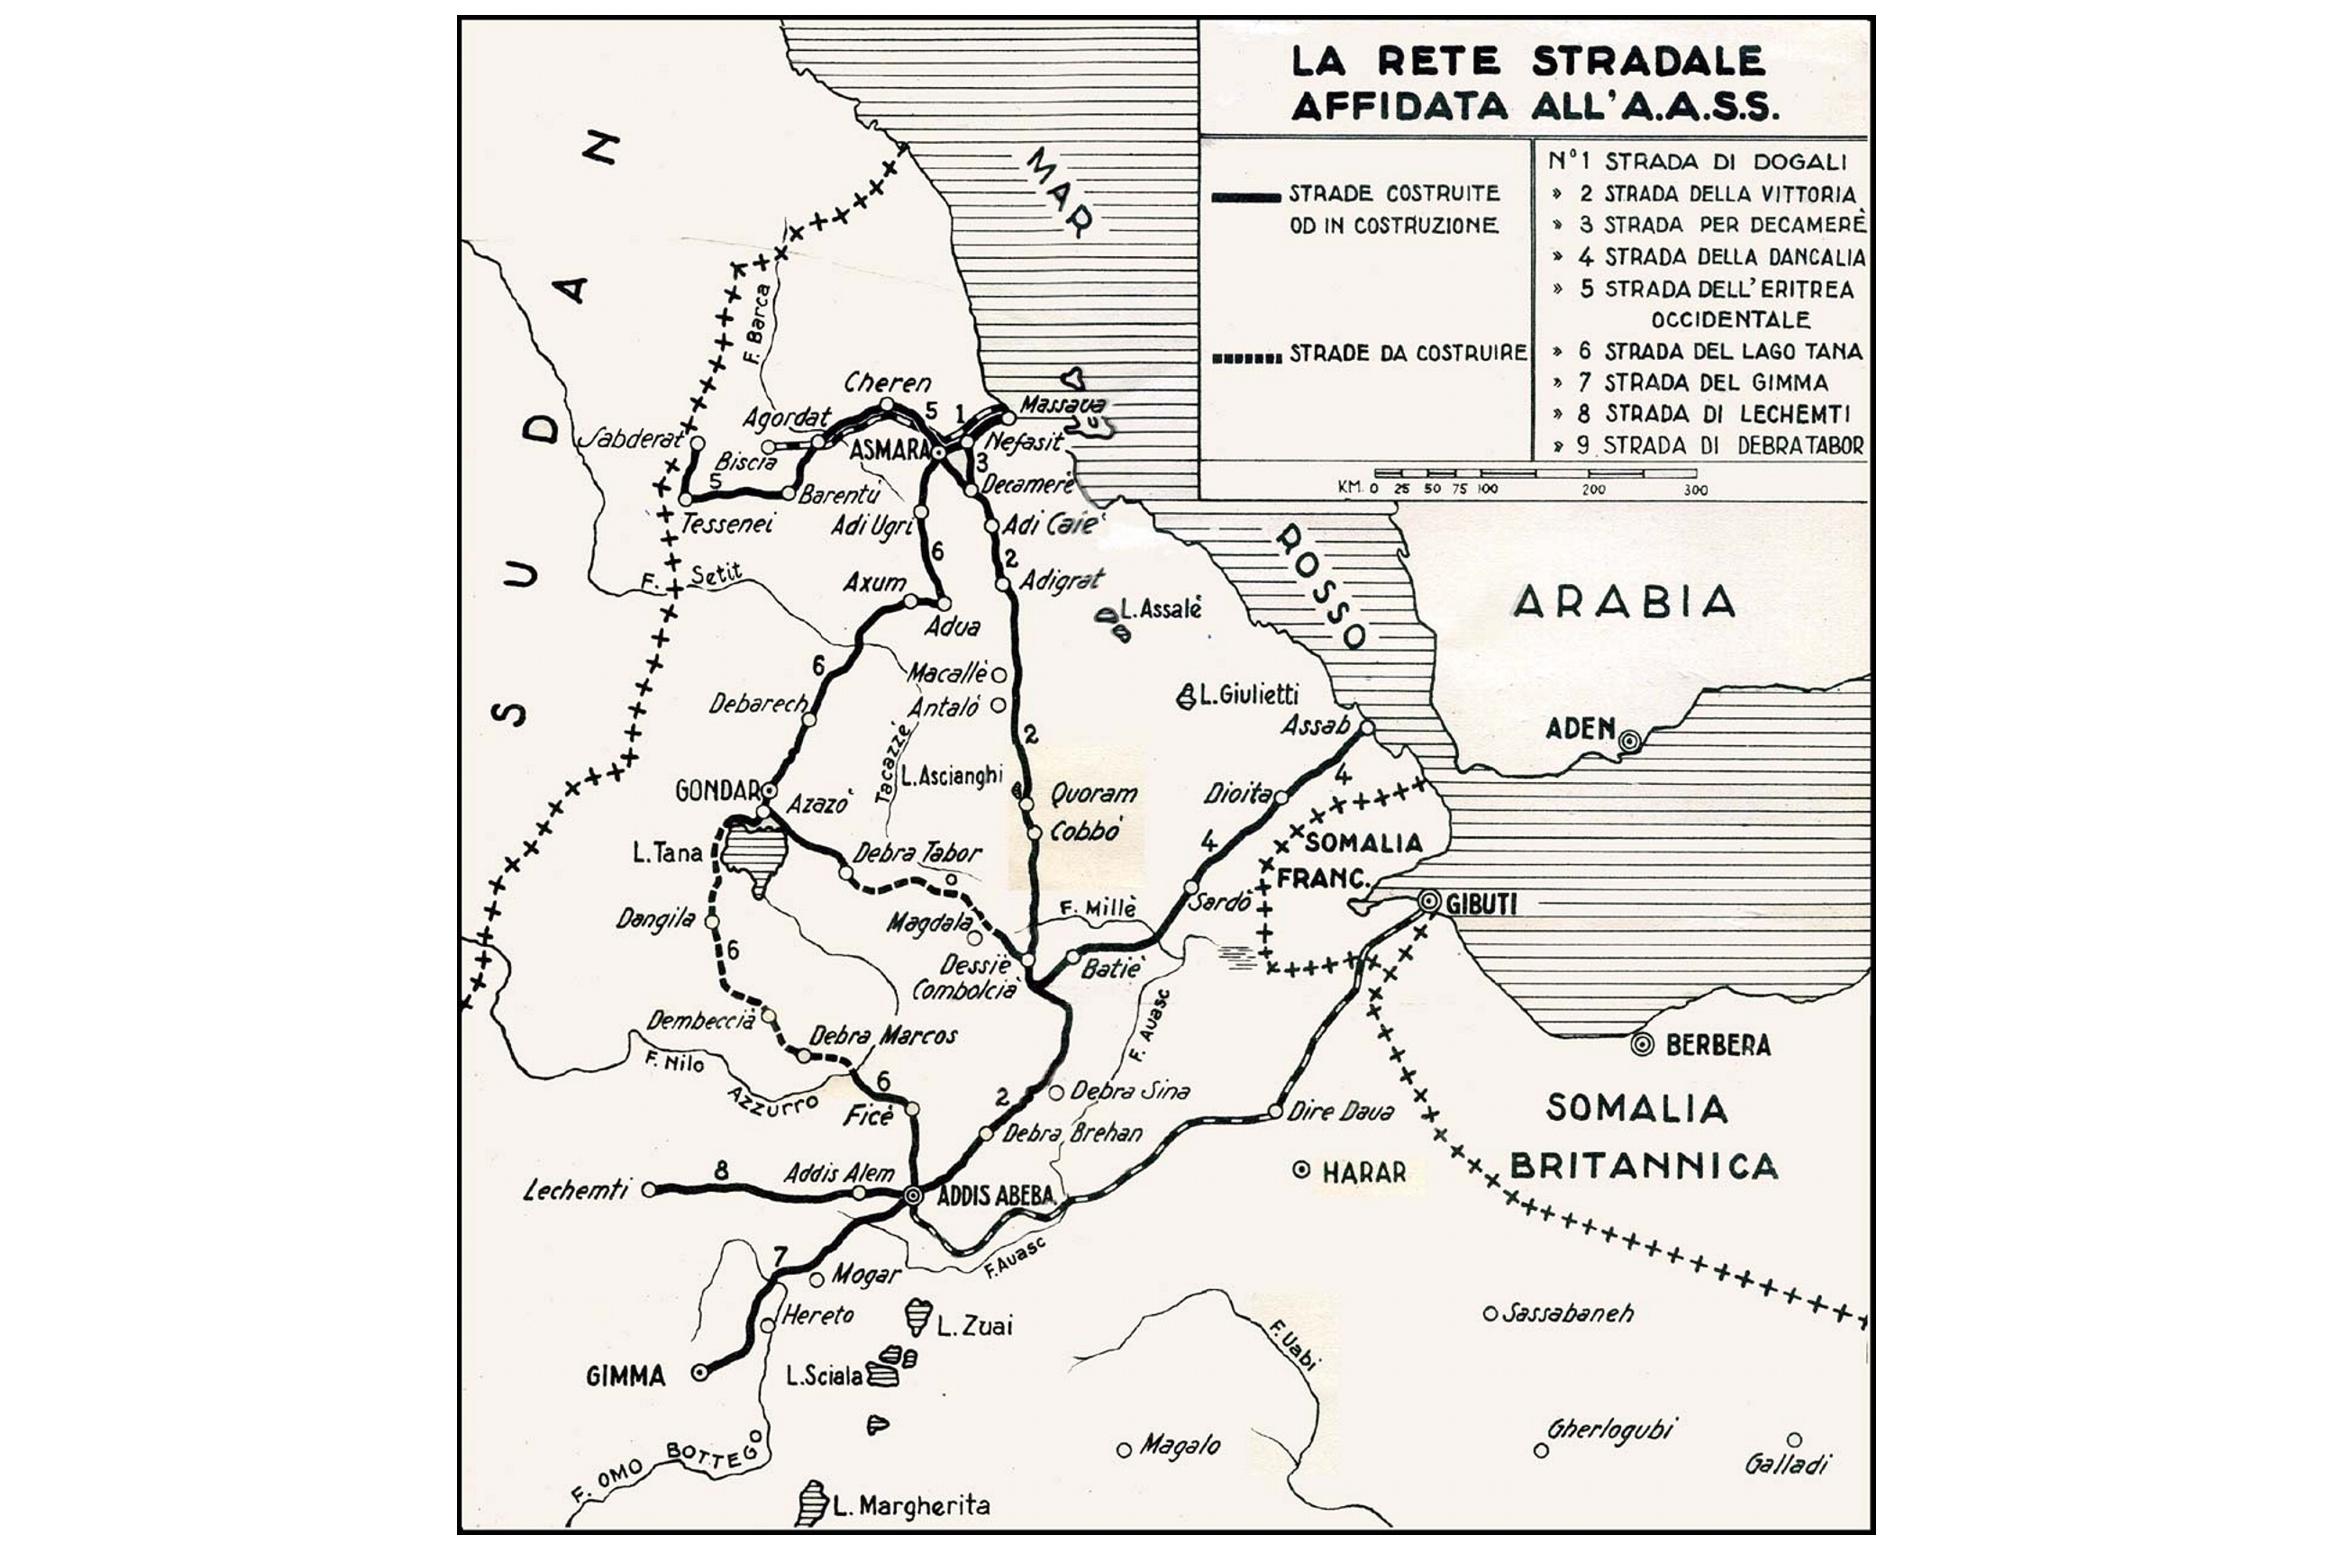 Le strade italiane in Africa Orientale